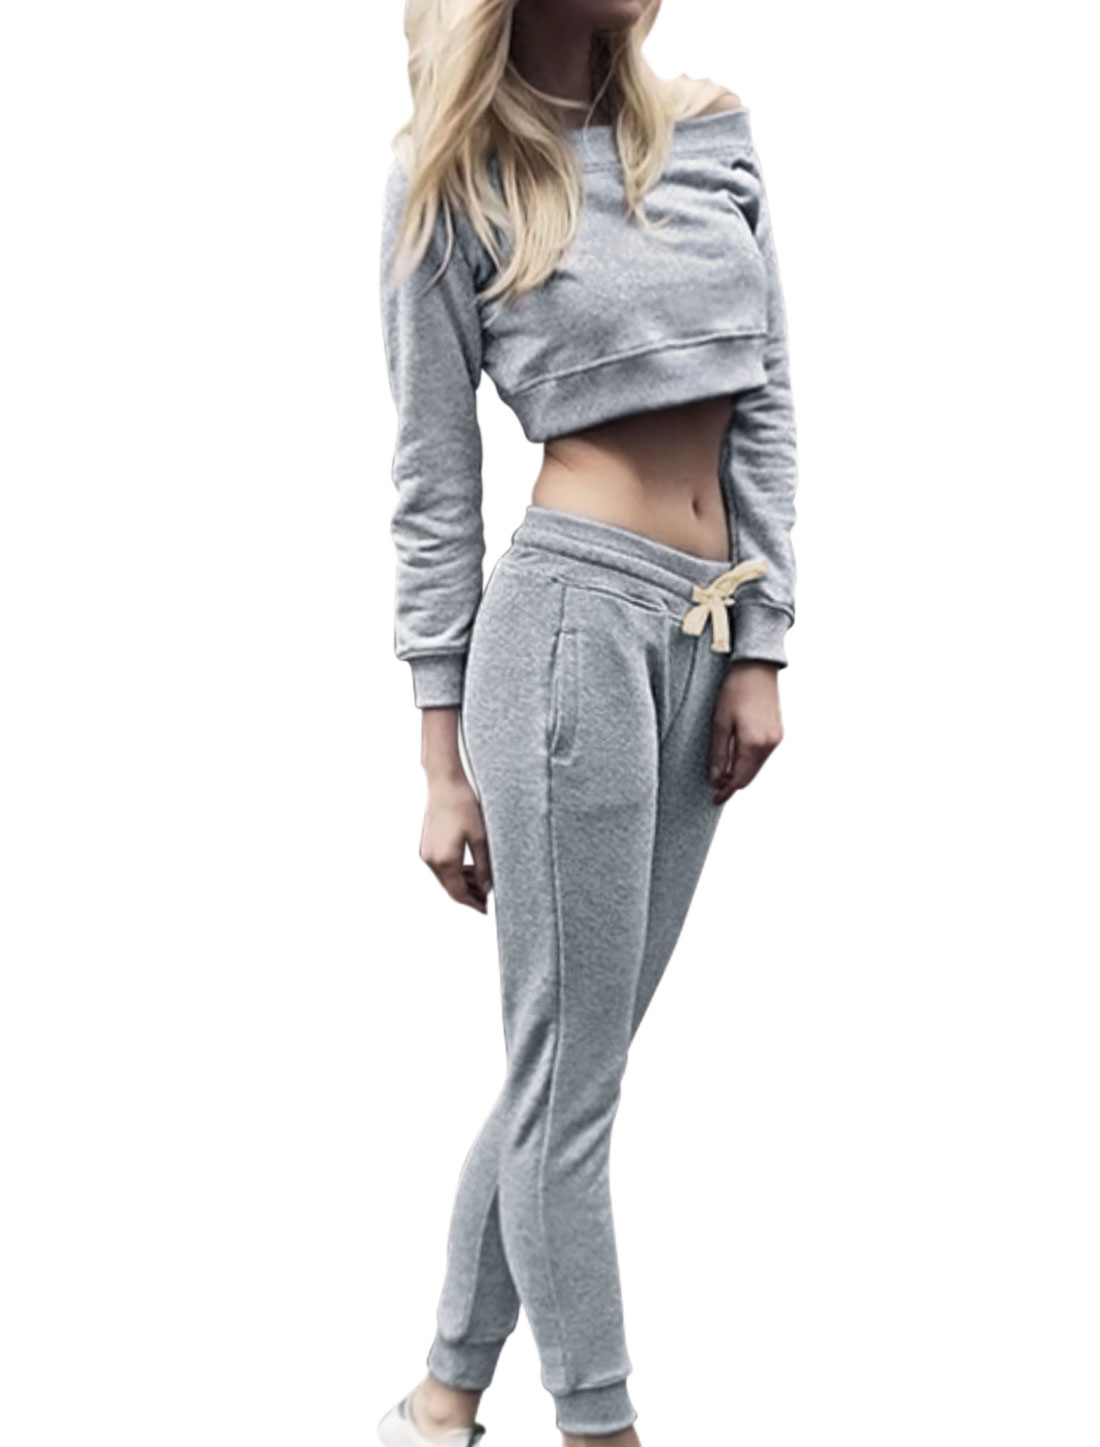 Women-Off-Shoulder-Long-Sleeve-Cropped-Top-w-Drawstring-Waist-Pants-Set